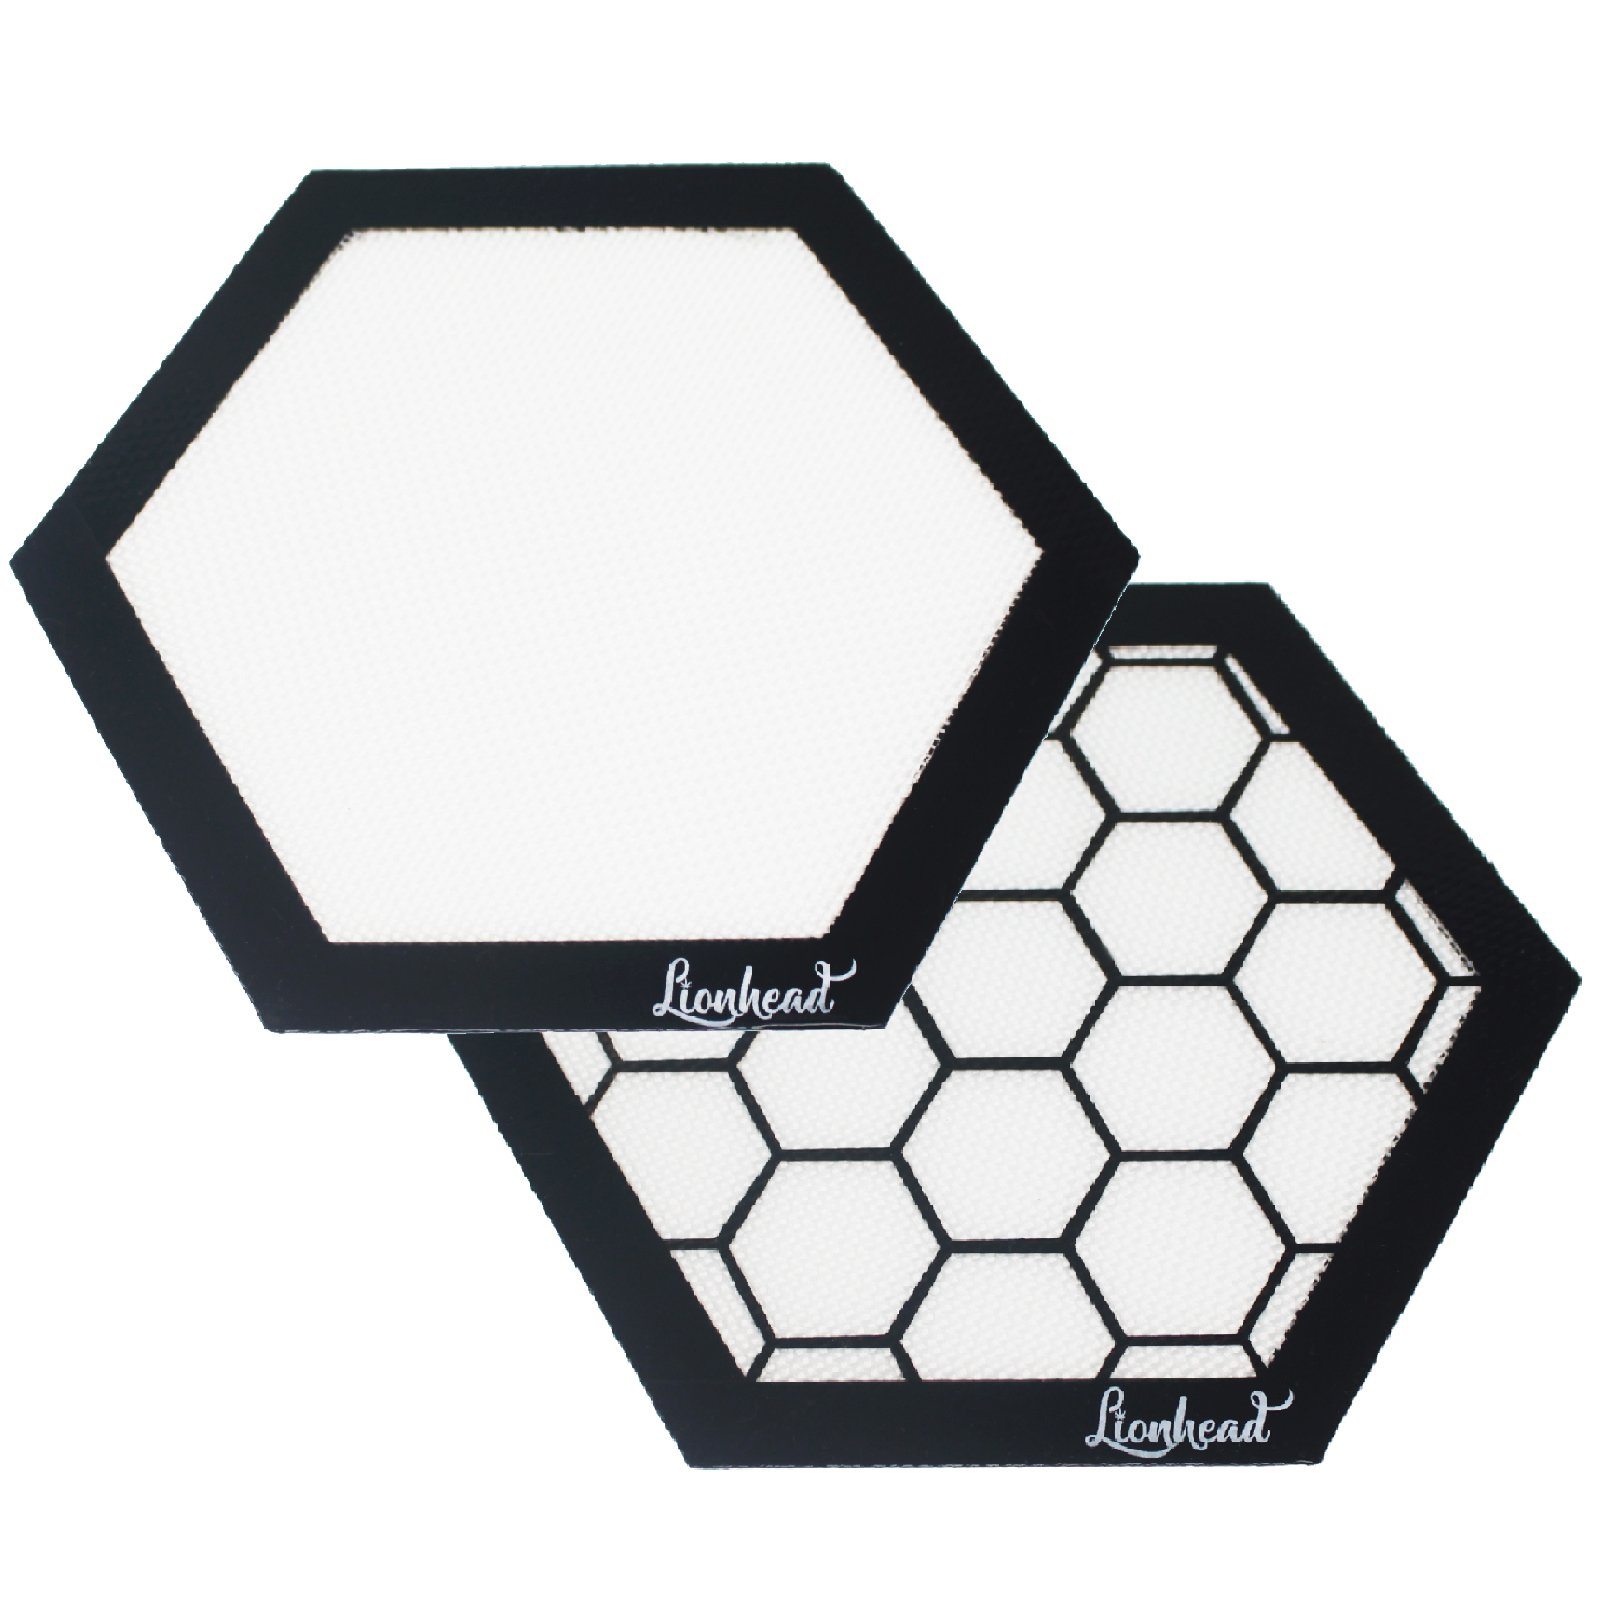 Silicone Dab Mats - (2) 8'' Hexagon Mats - Lionhead